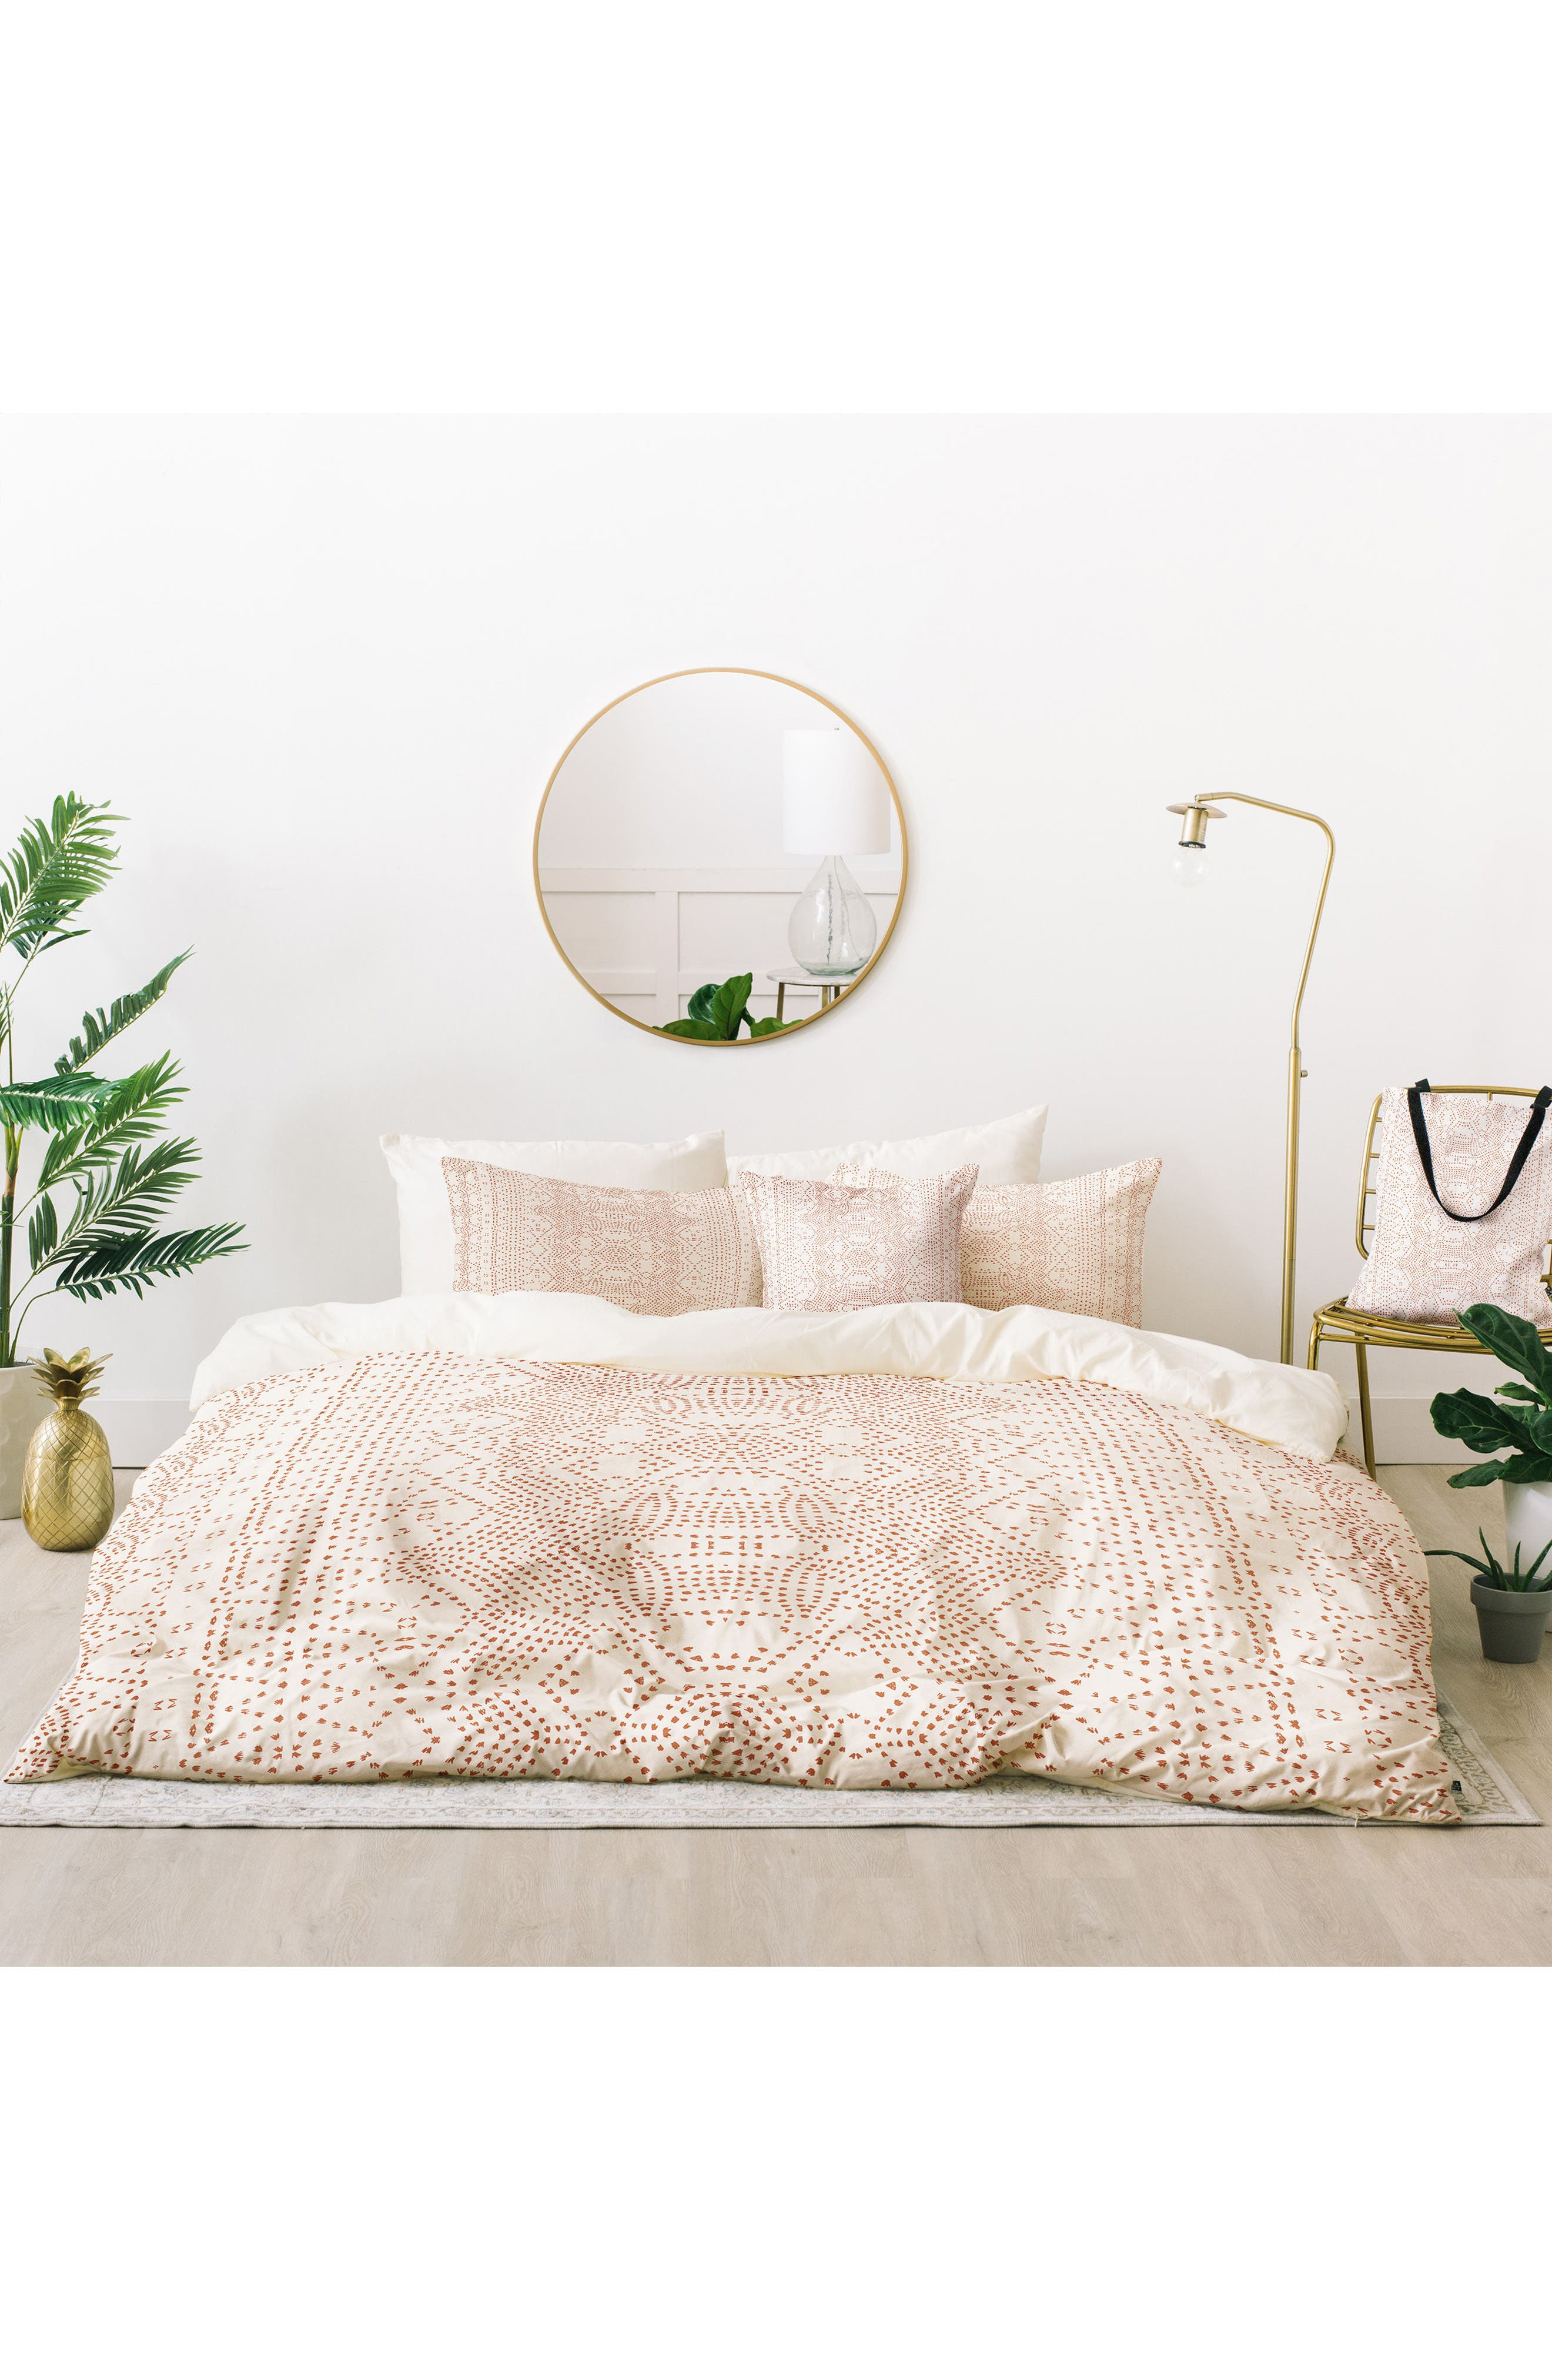 Holli Zollinger Marrakeshi Bed in a Bag Duvet Cover, Sham & Accent Pillow Set,                         Main,                         color, 800